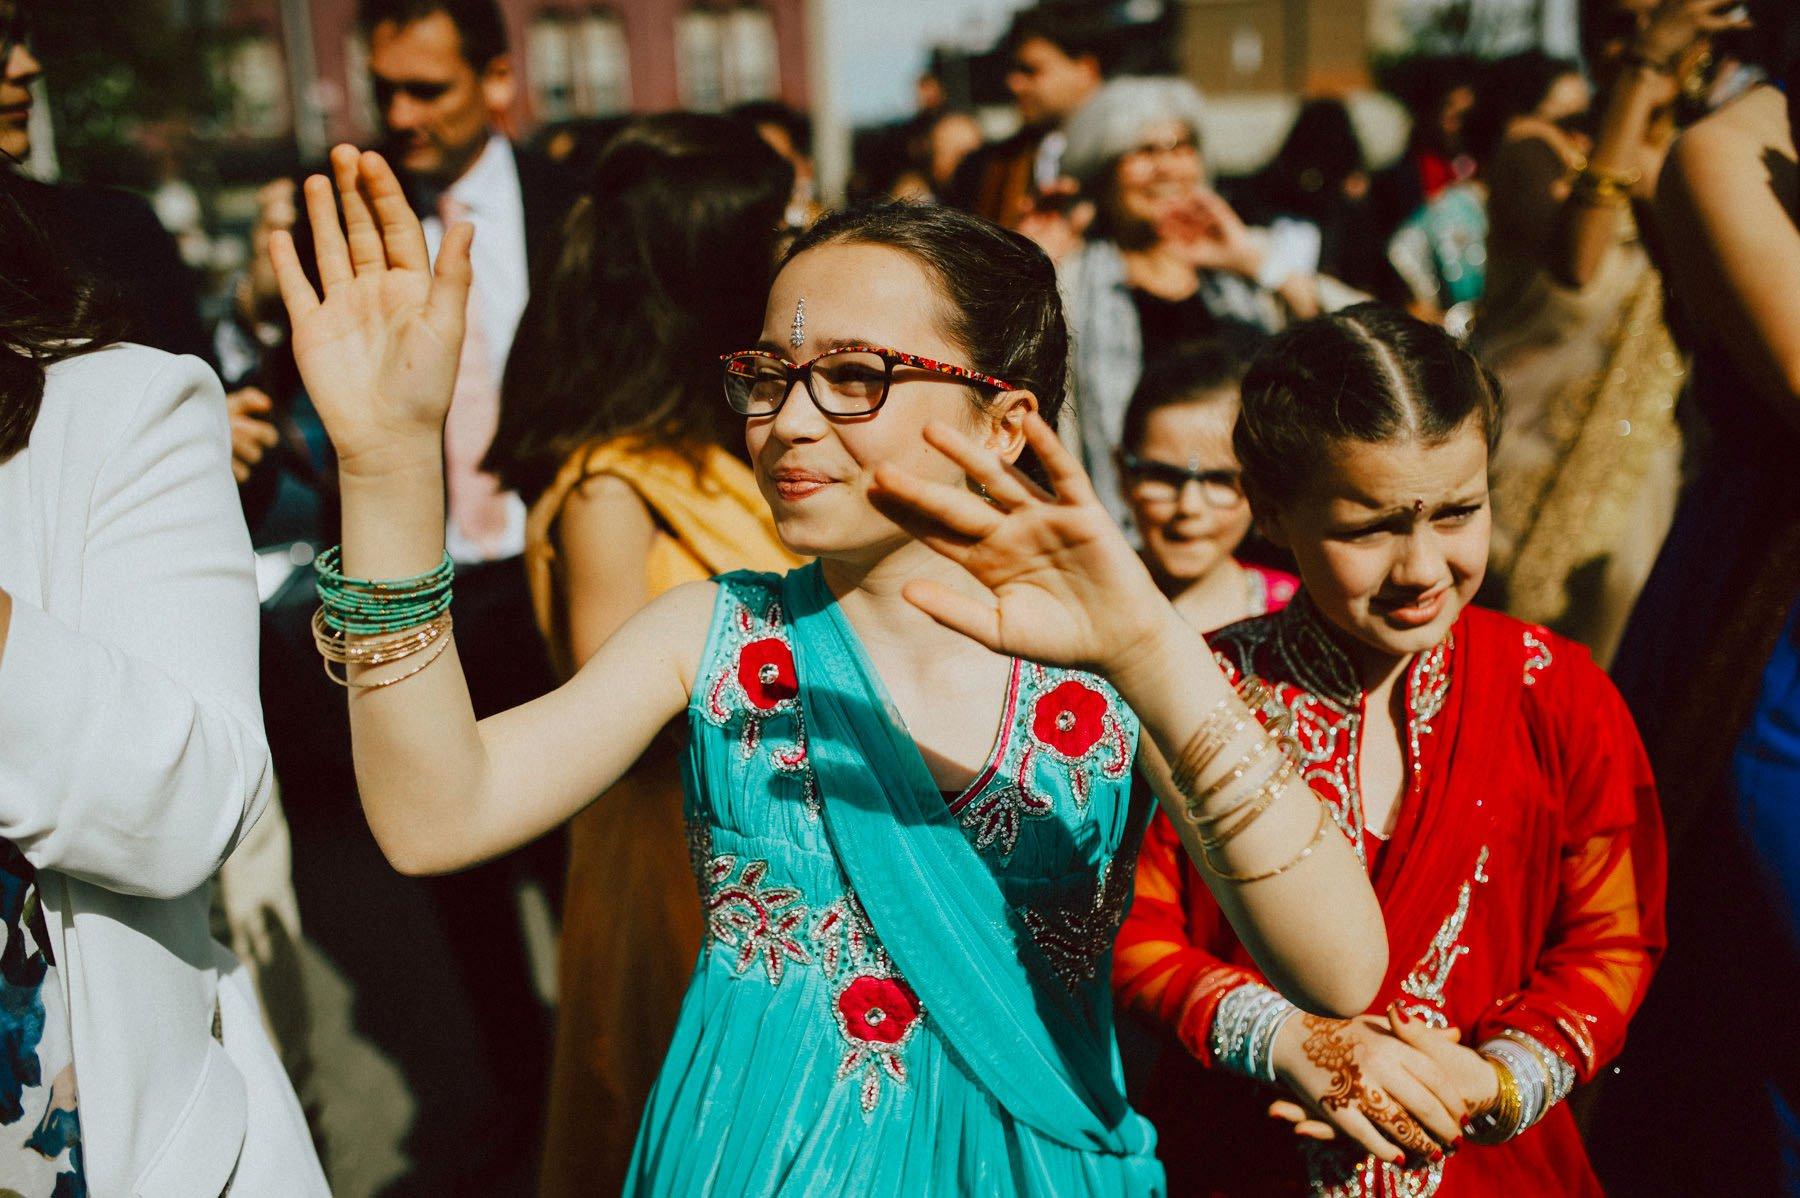 vie-philadelphia-indian-wedding-59.jpg